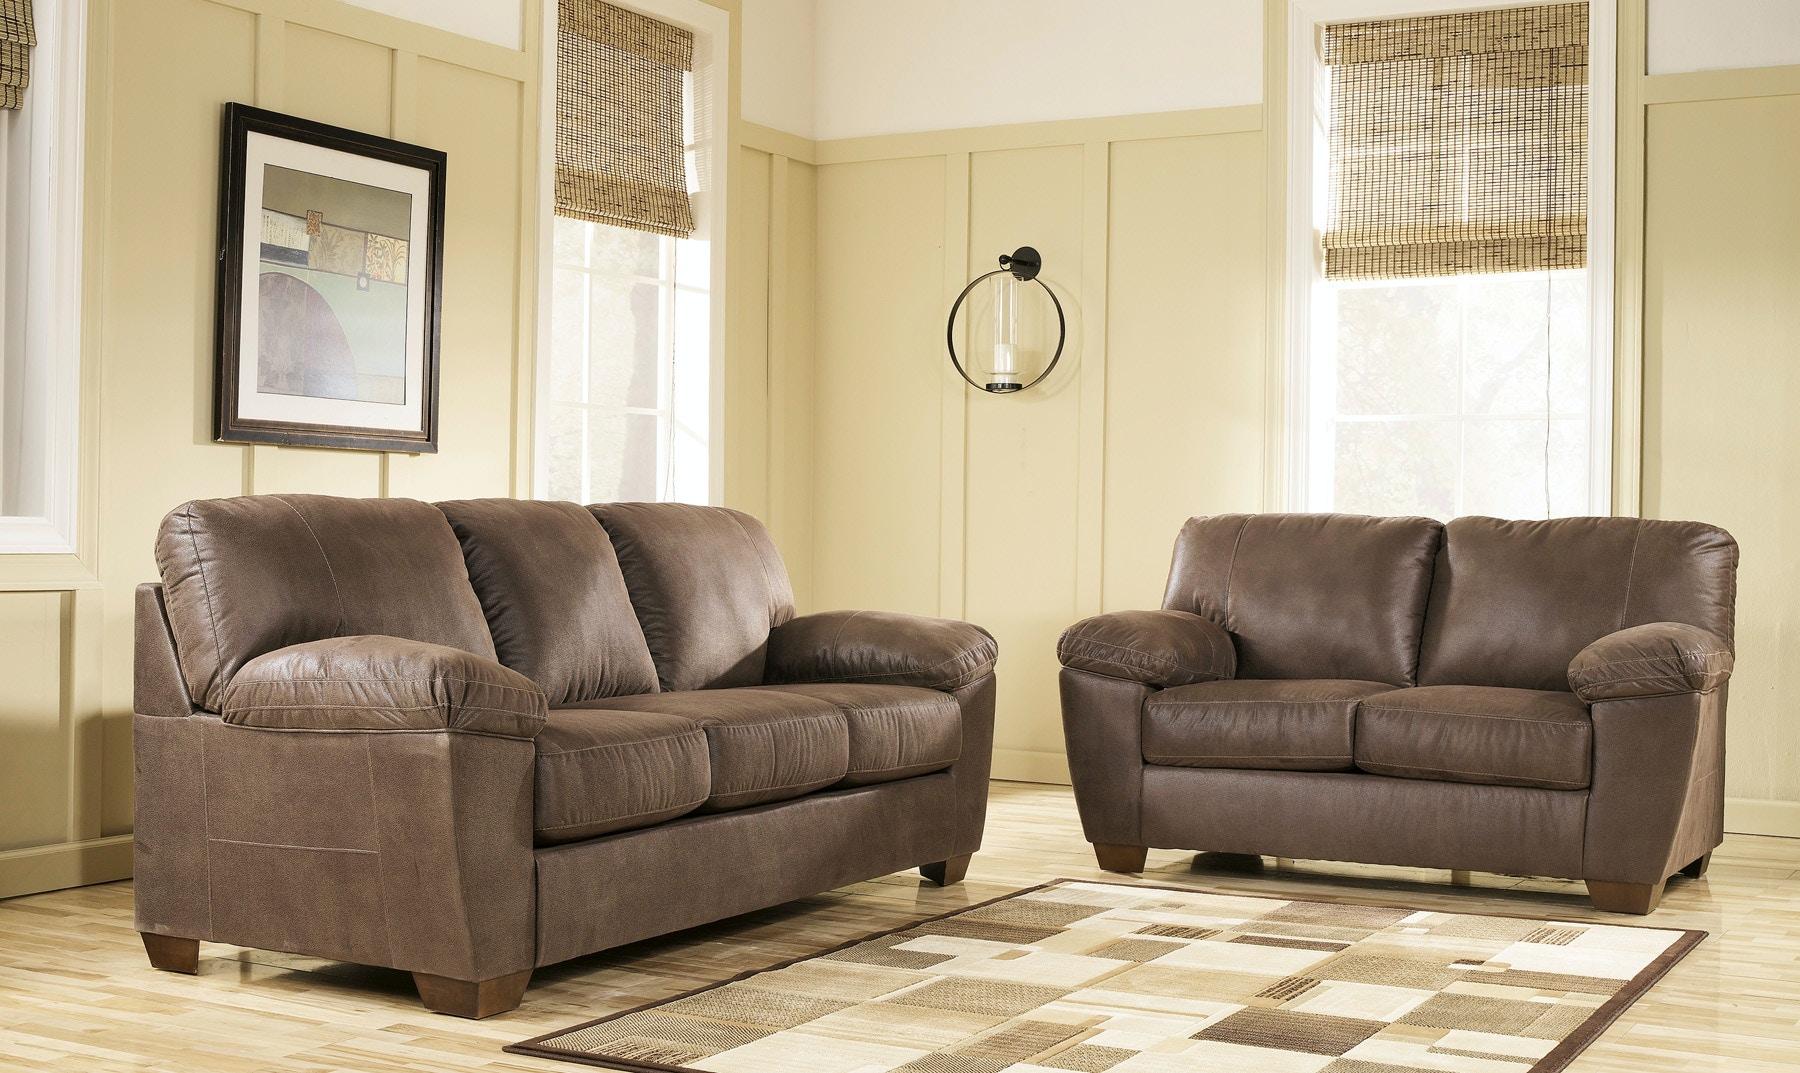 Signature Design By Ashley Living Room Amazon Sofa And Loveseat Set 520310 Furniture Fair